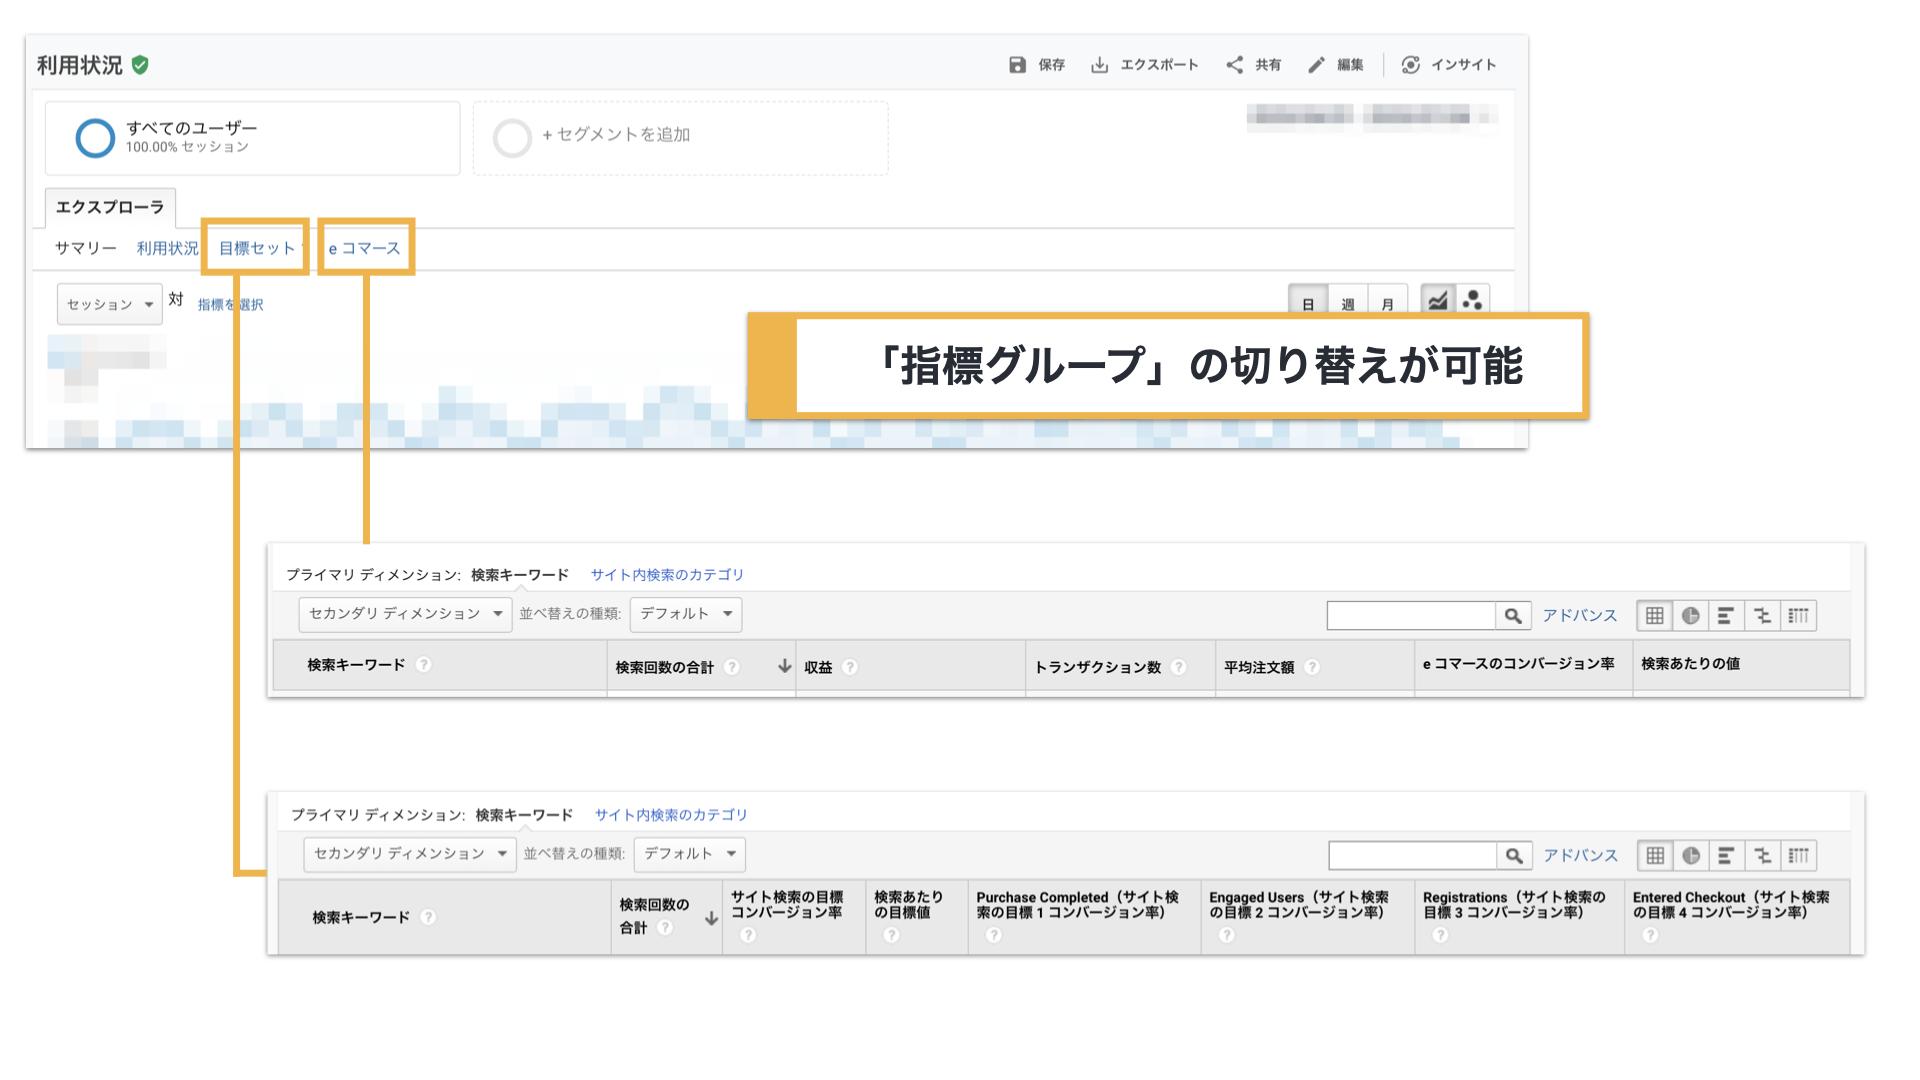 ga-site-search-metrics-group